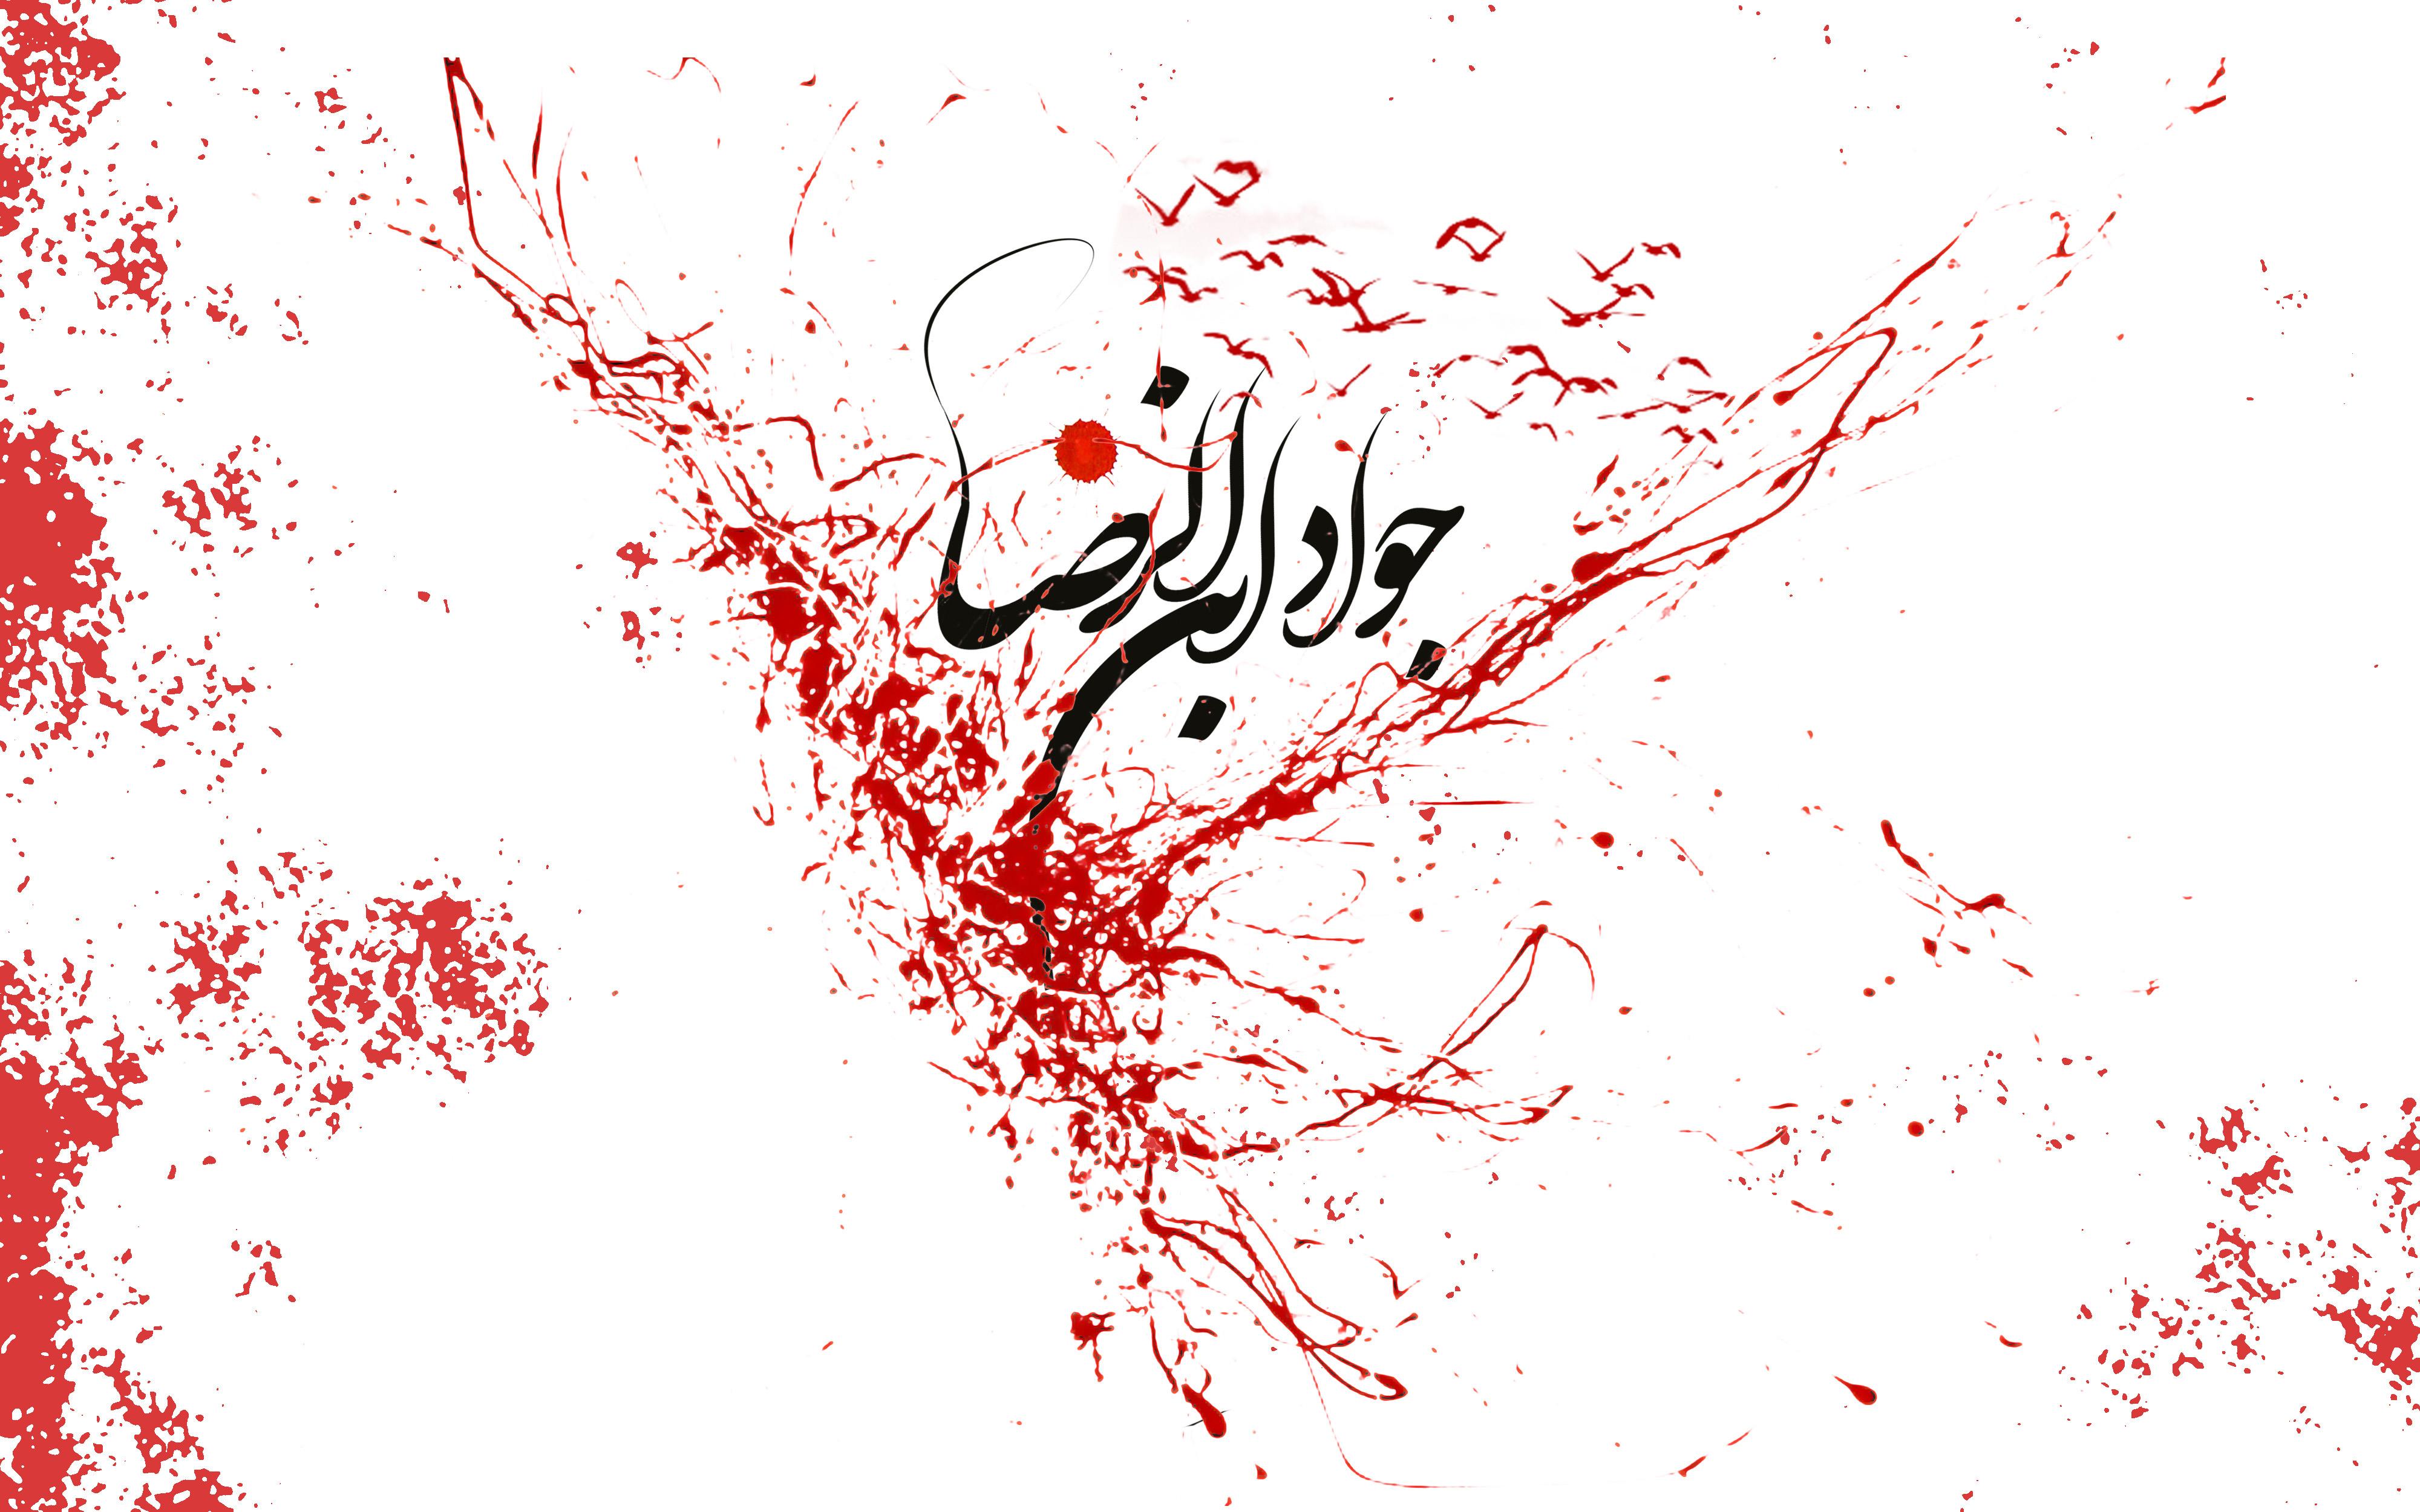 عکس پروفایل شهادت امام جواد , تصاویر شهادت امام جواد